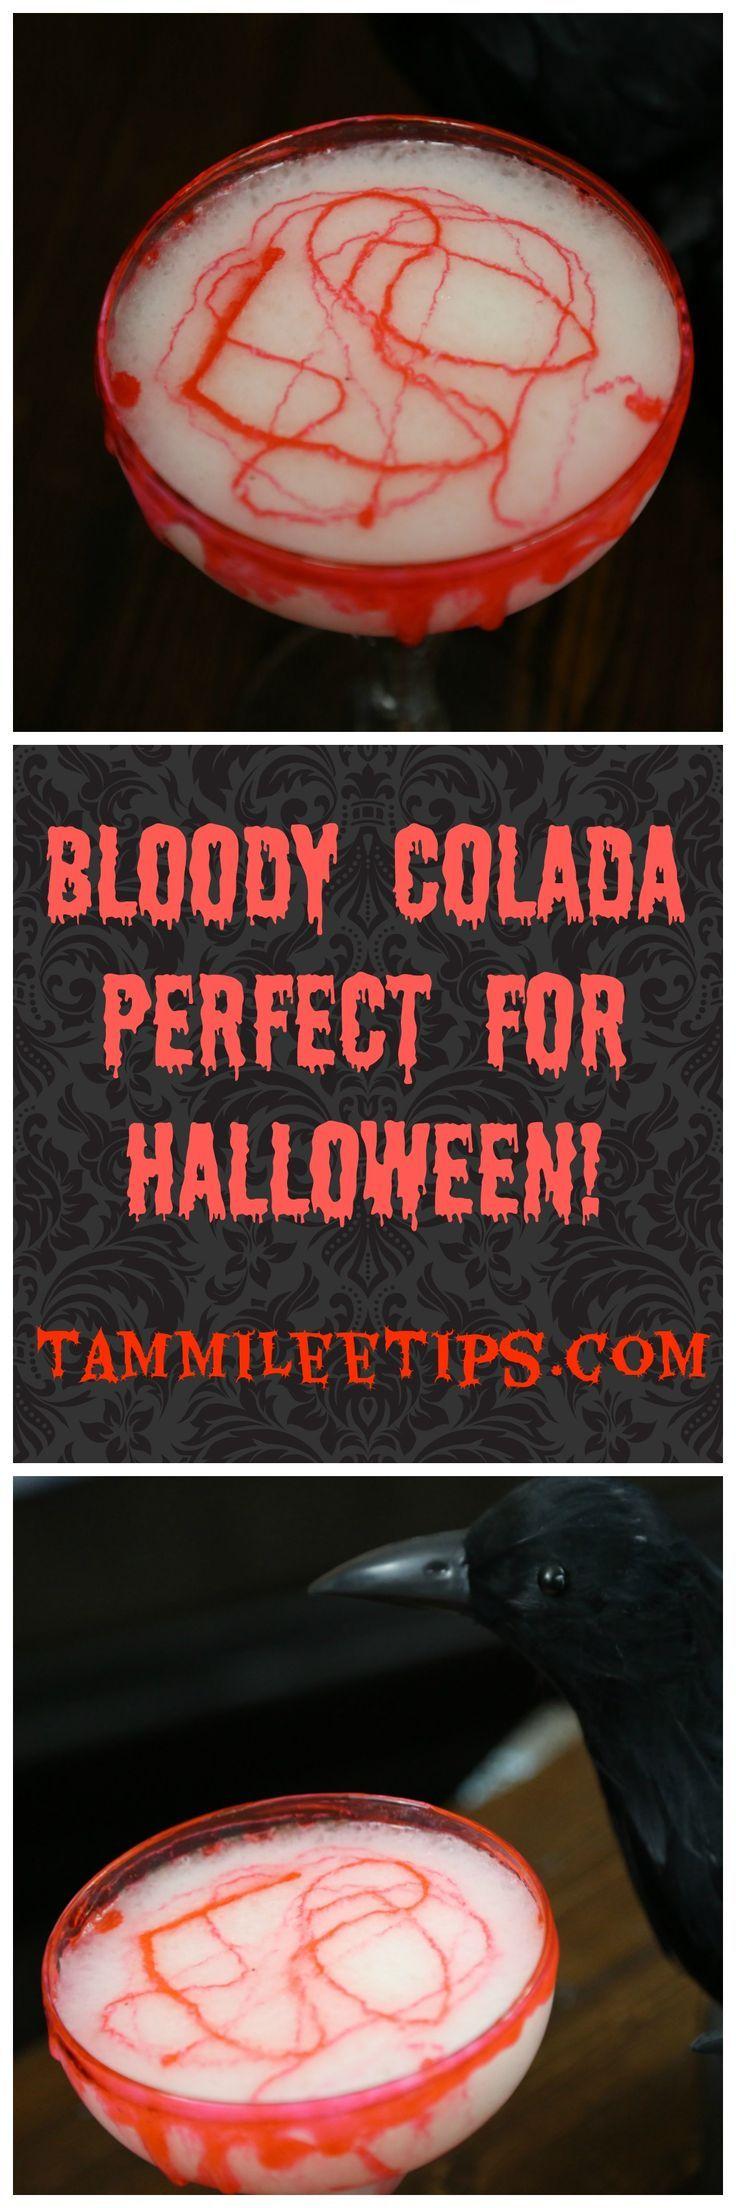 Top 25+ best Halloween party supplies ideas on Pinterest   Spider ...